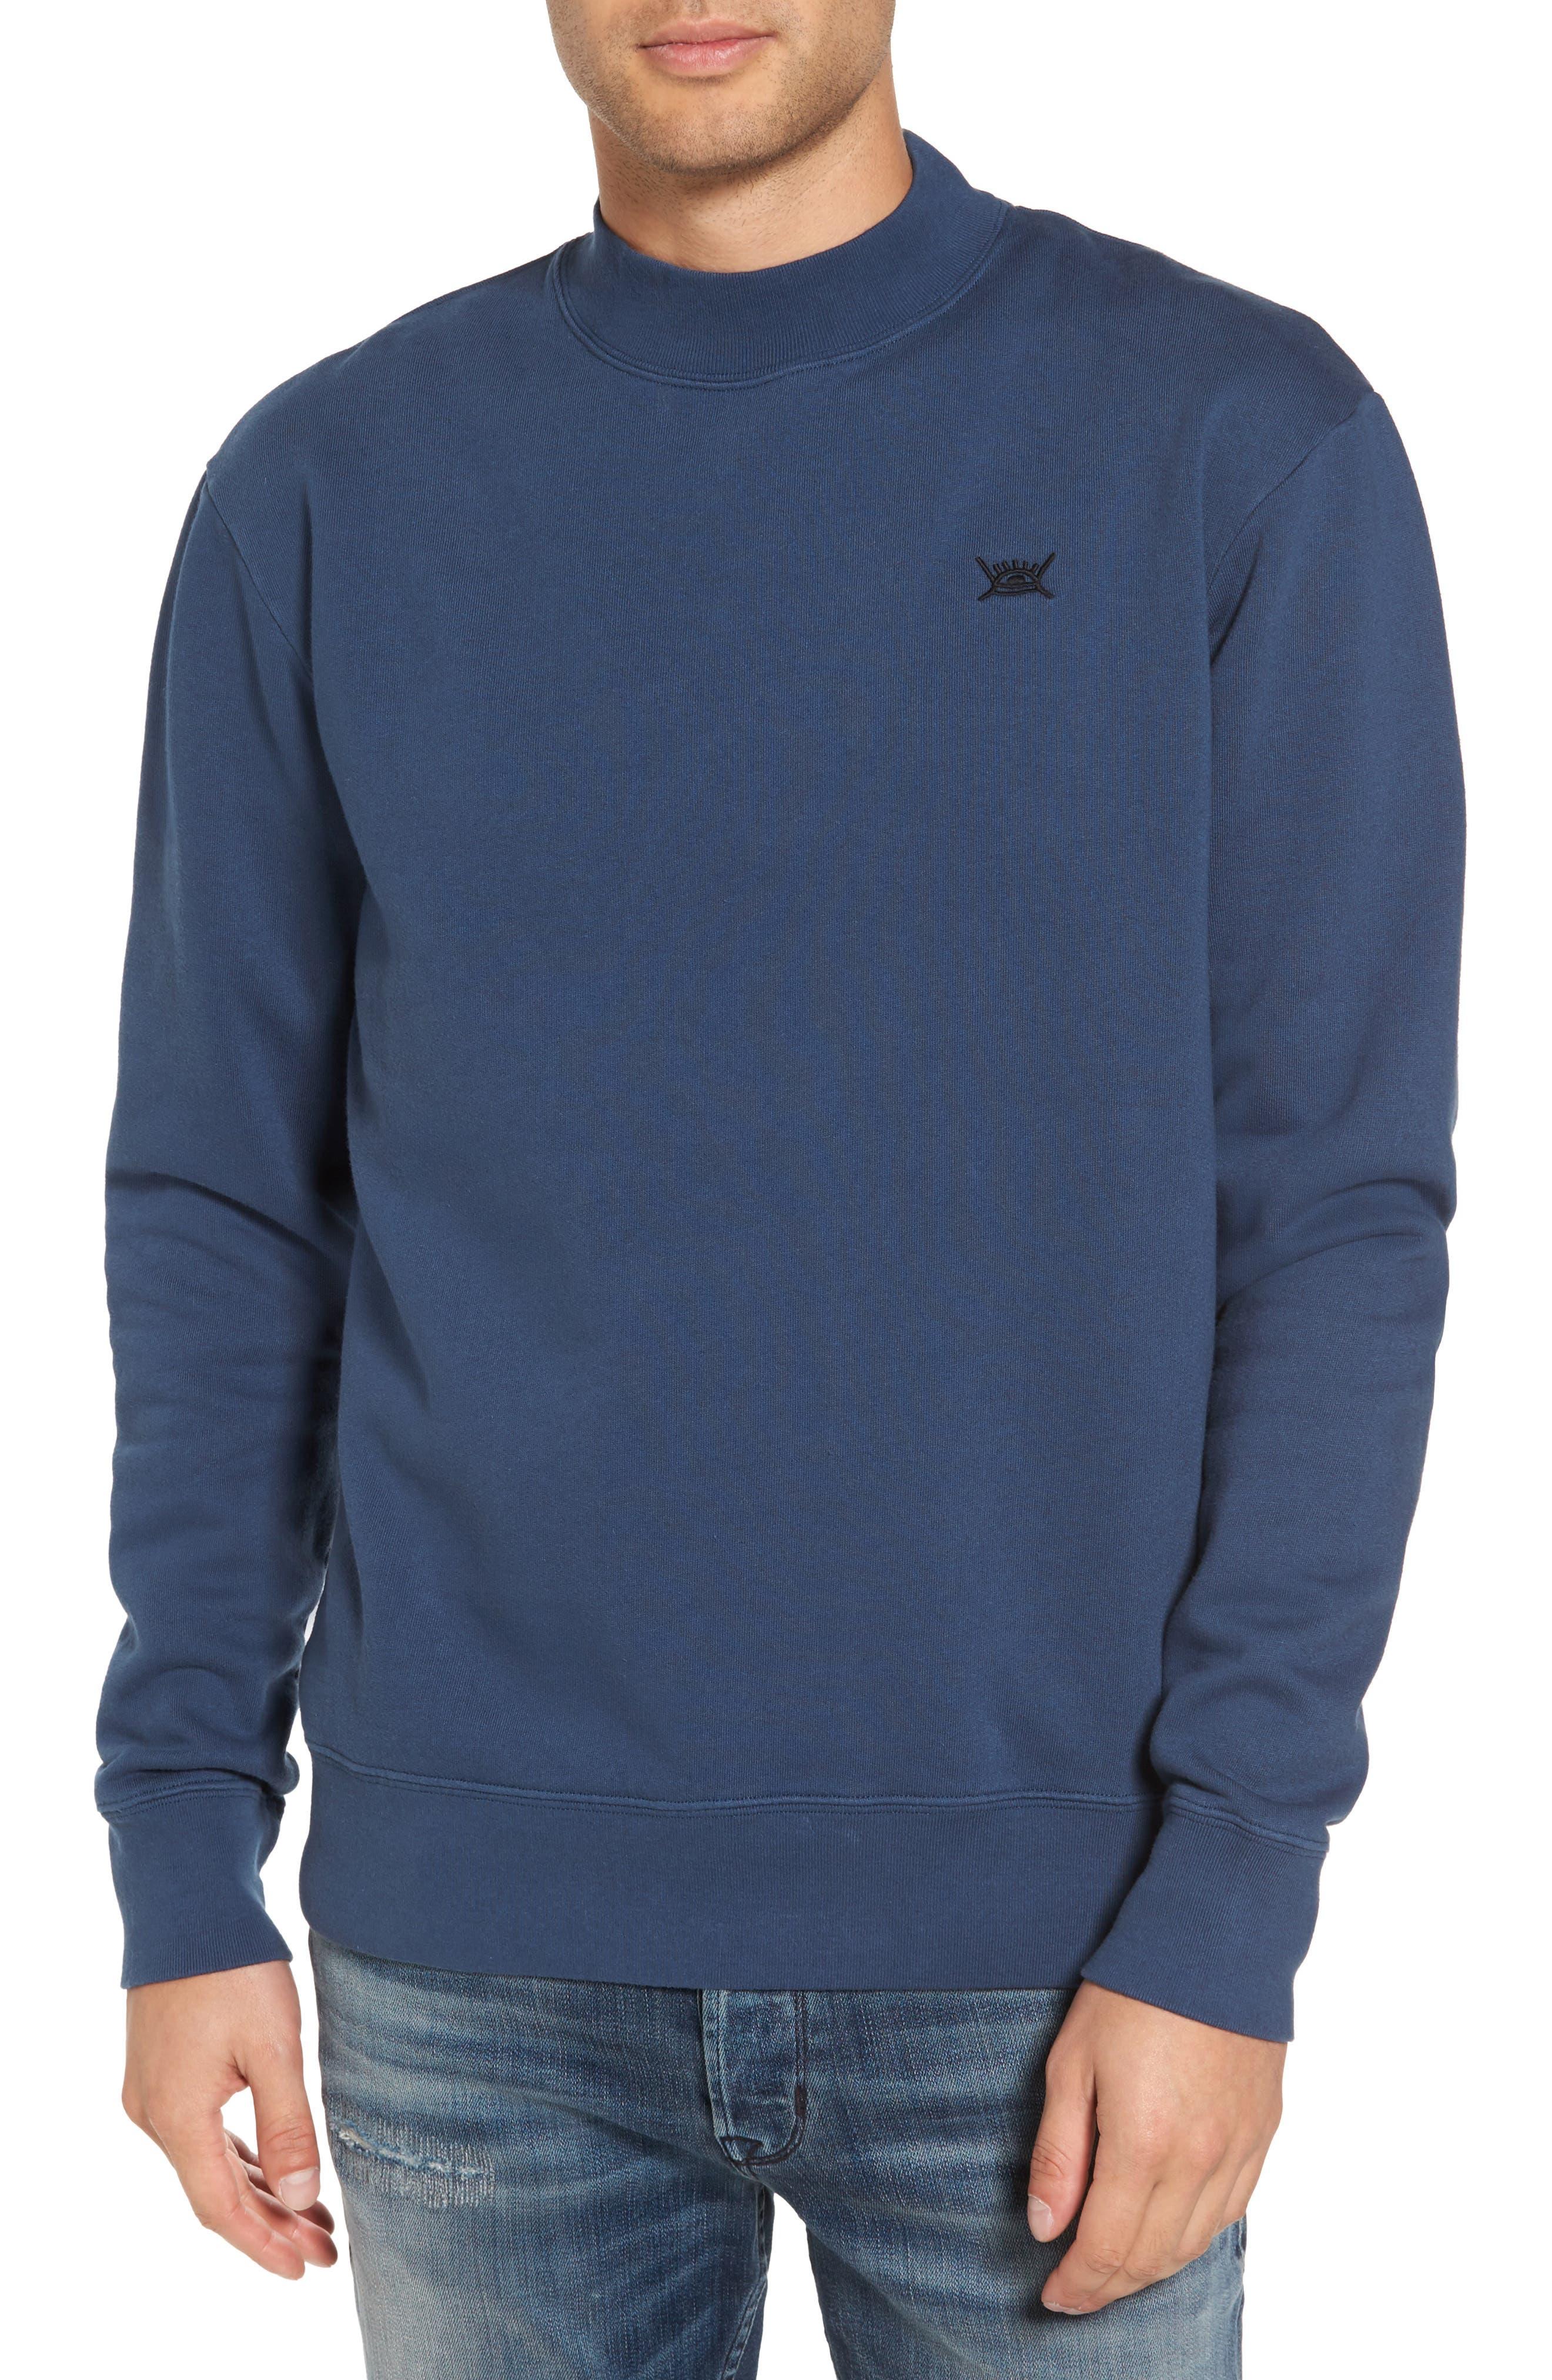 Steve Fleece Sweatshirt,                         Main,                         color, 479